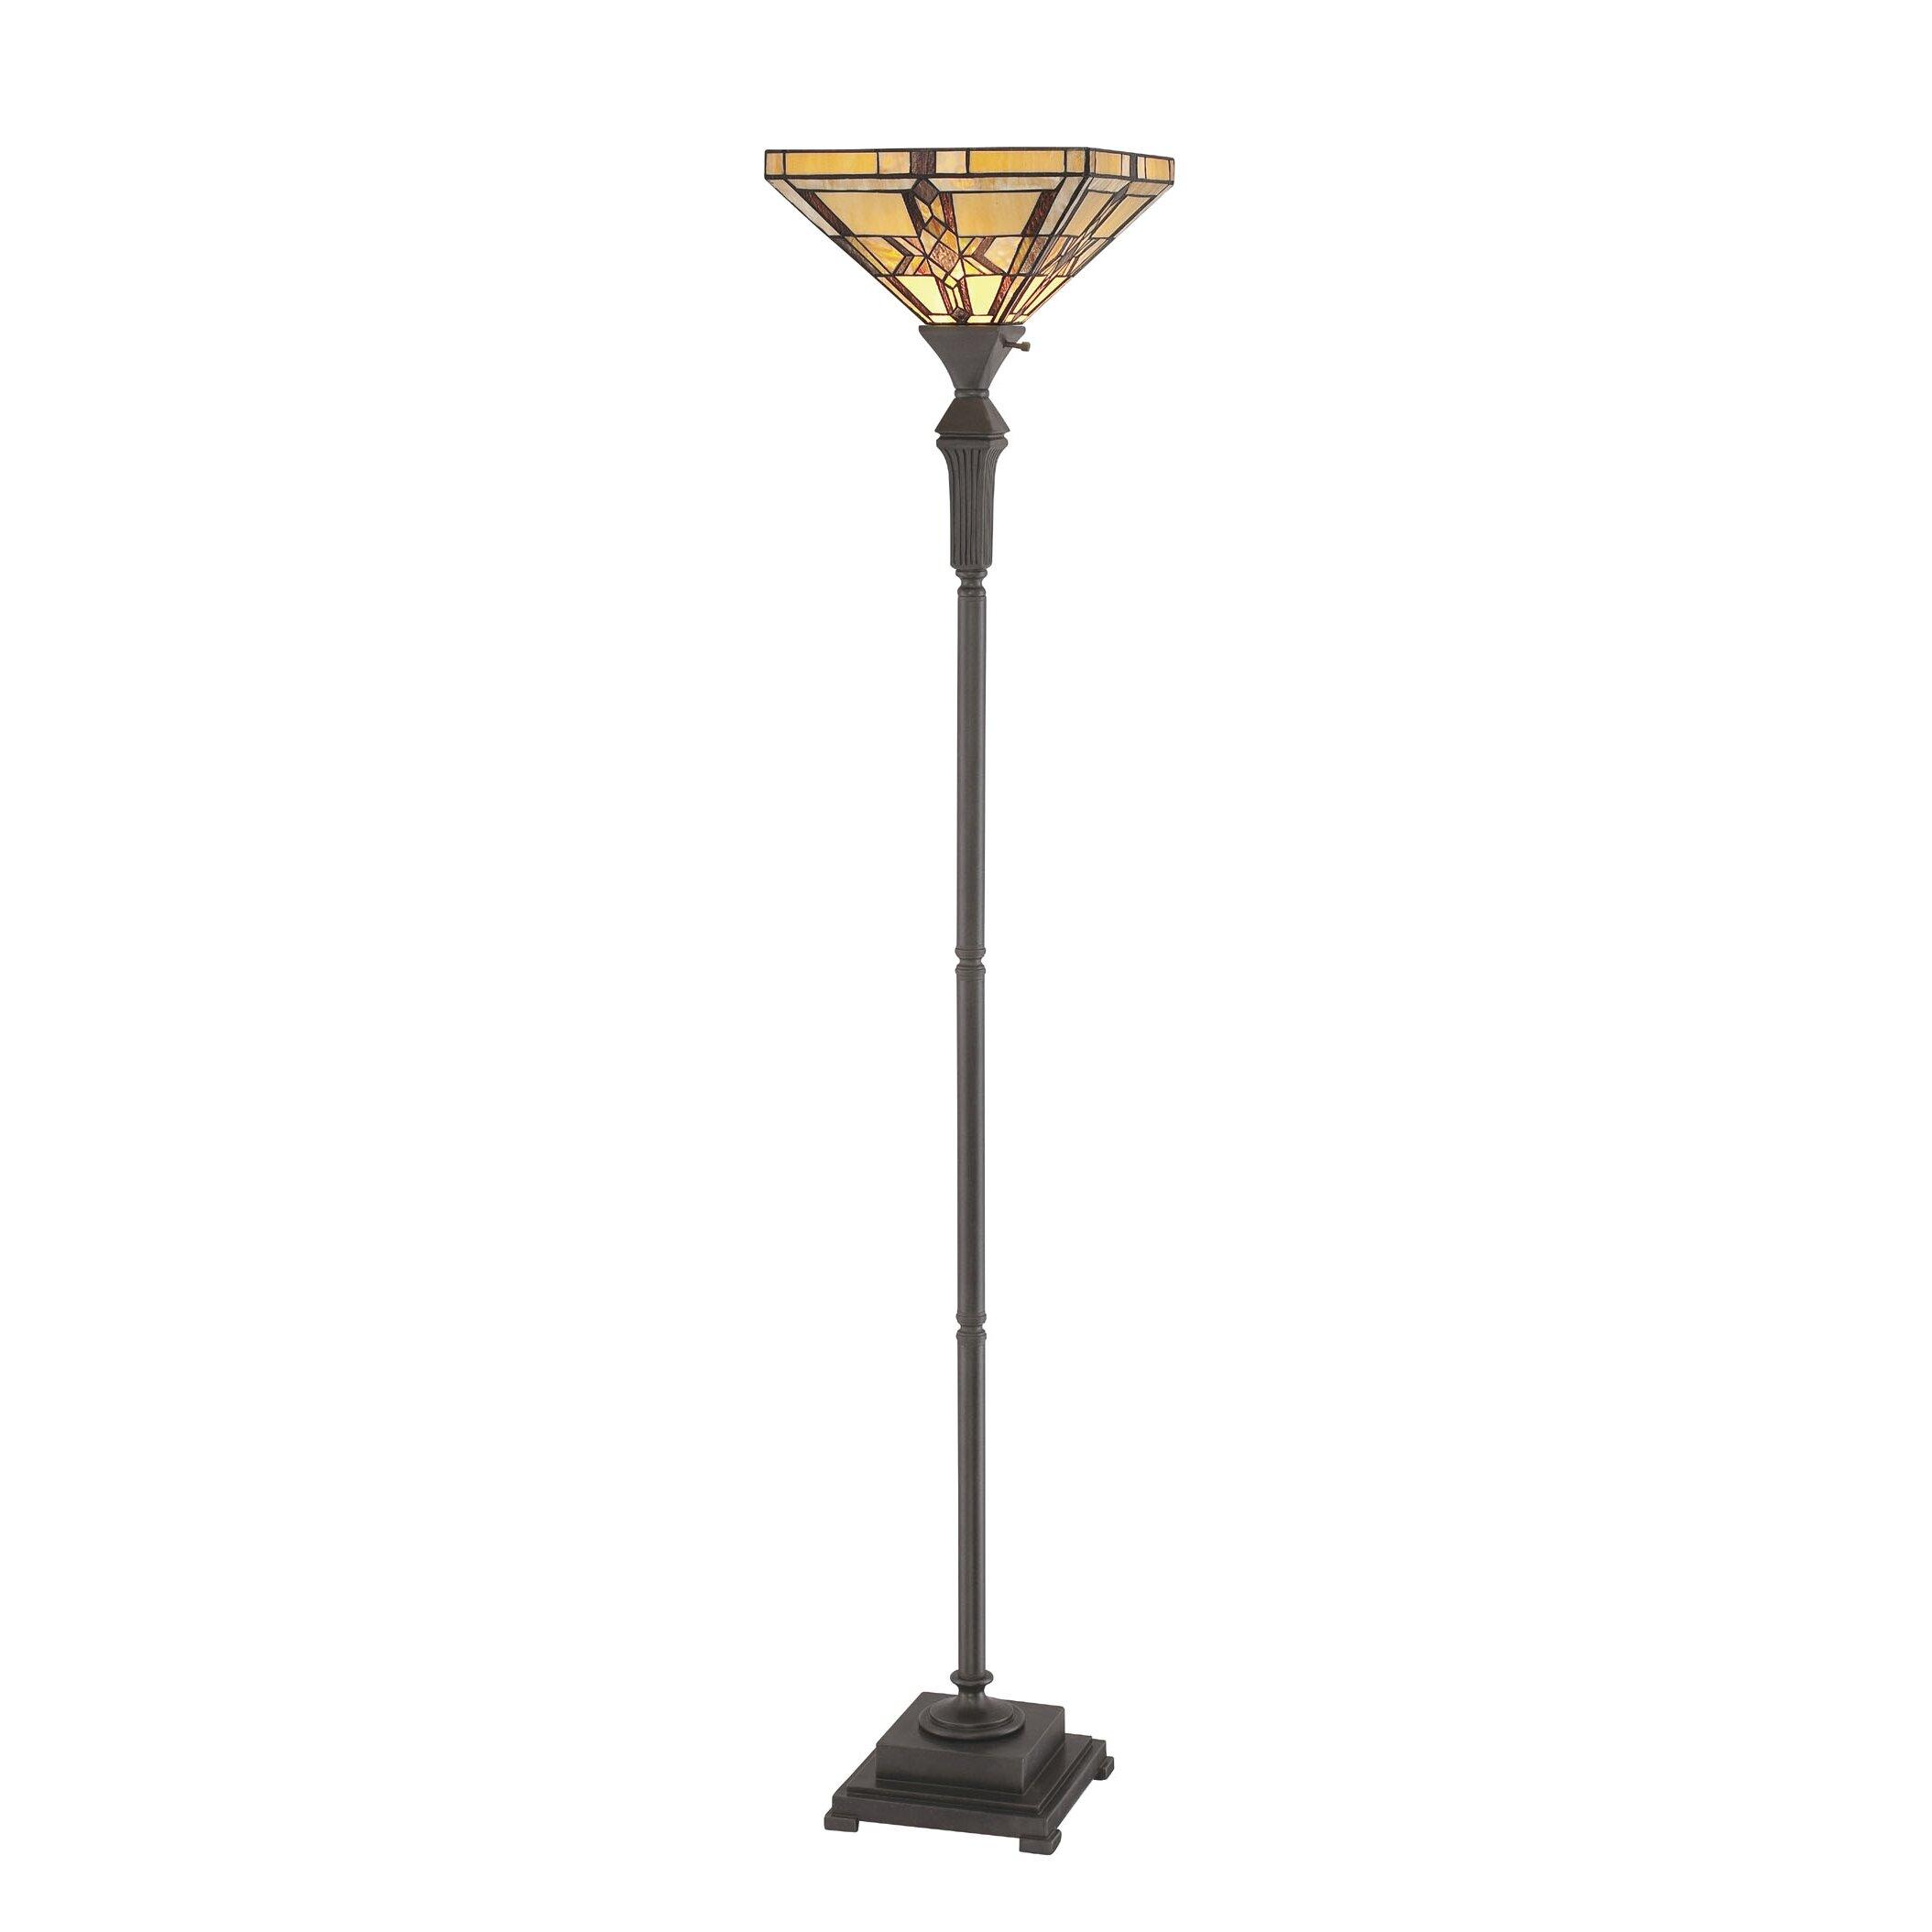 fine art lighting tiffany 72 torchiere floor lamp reviews wayfa. Black Bedroom Furniture Sets. Home Design Ideas